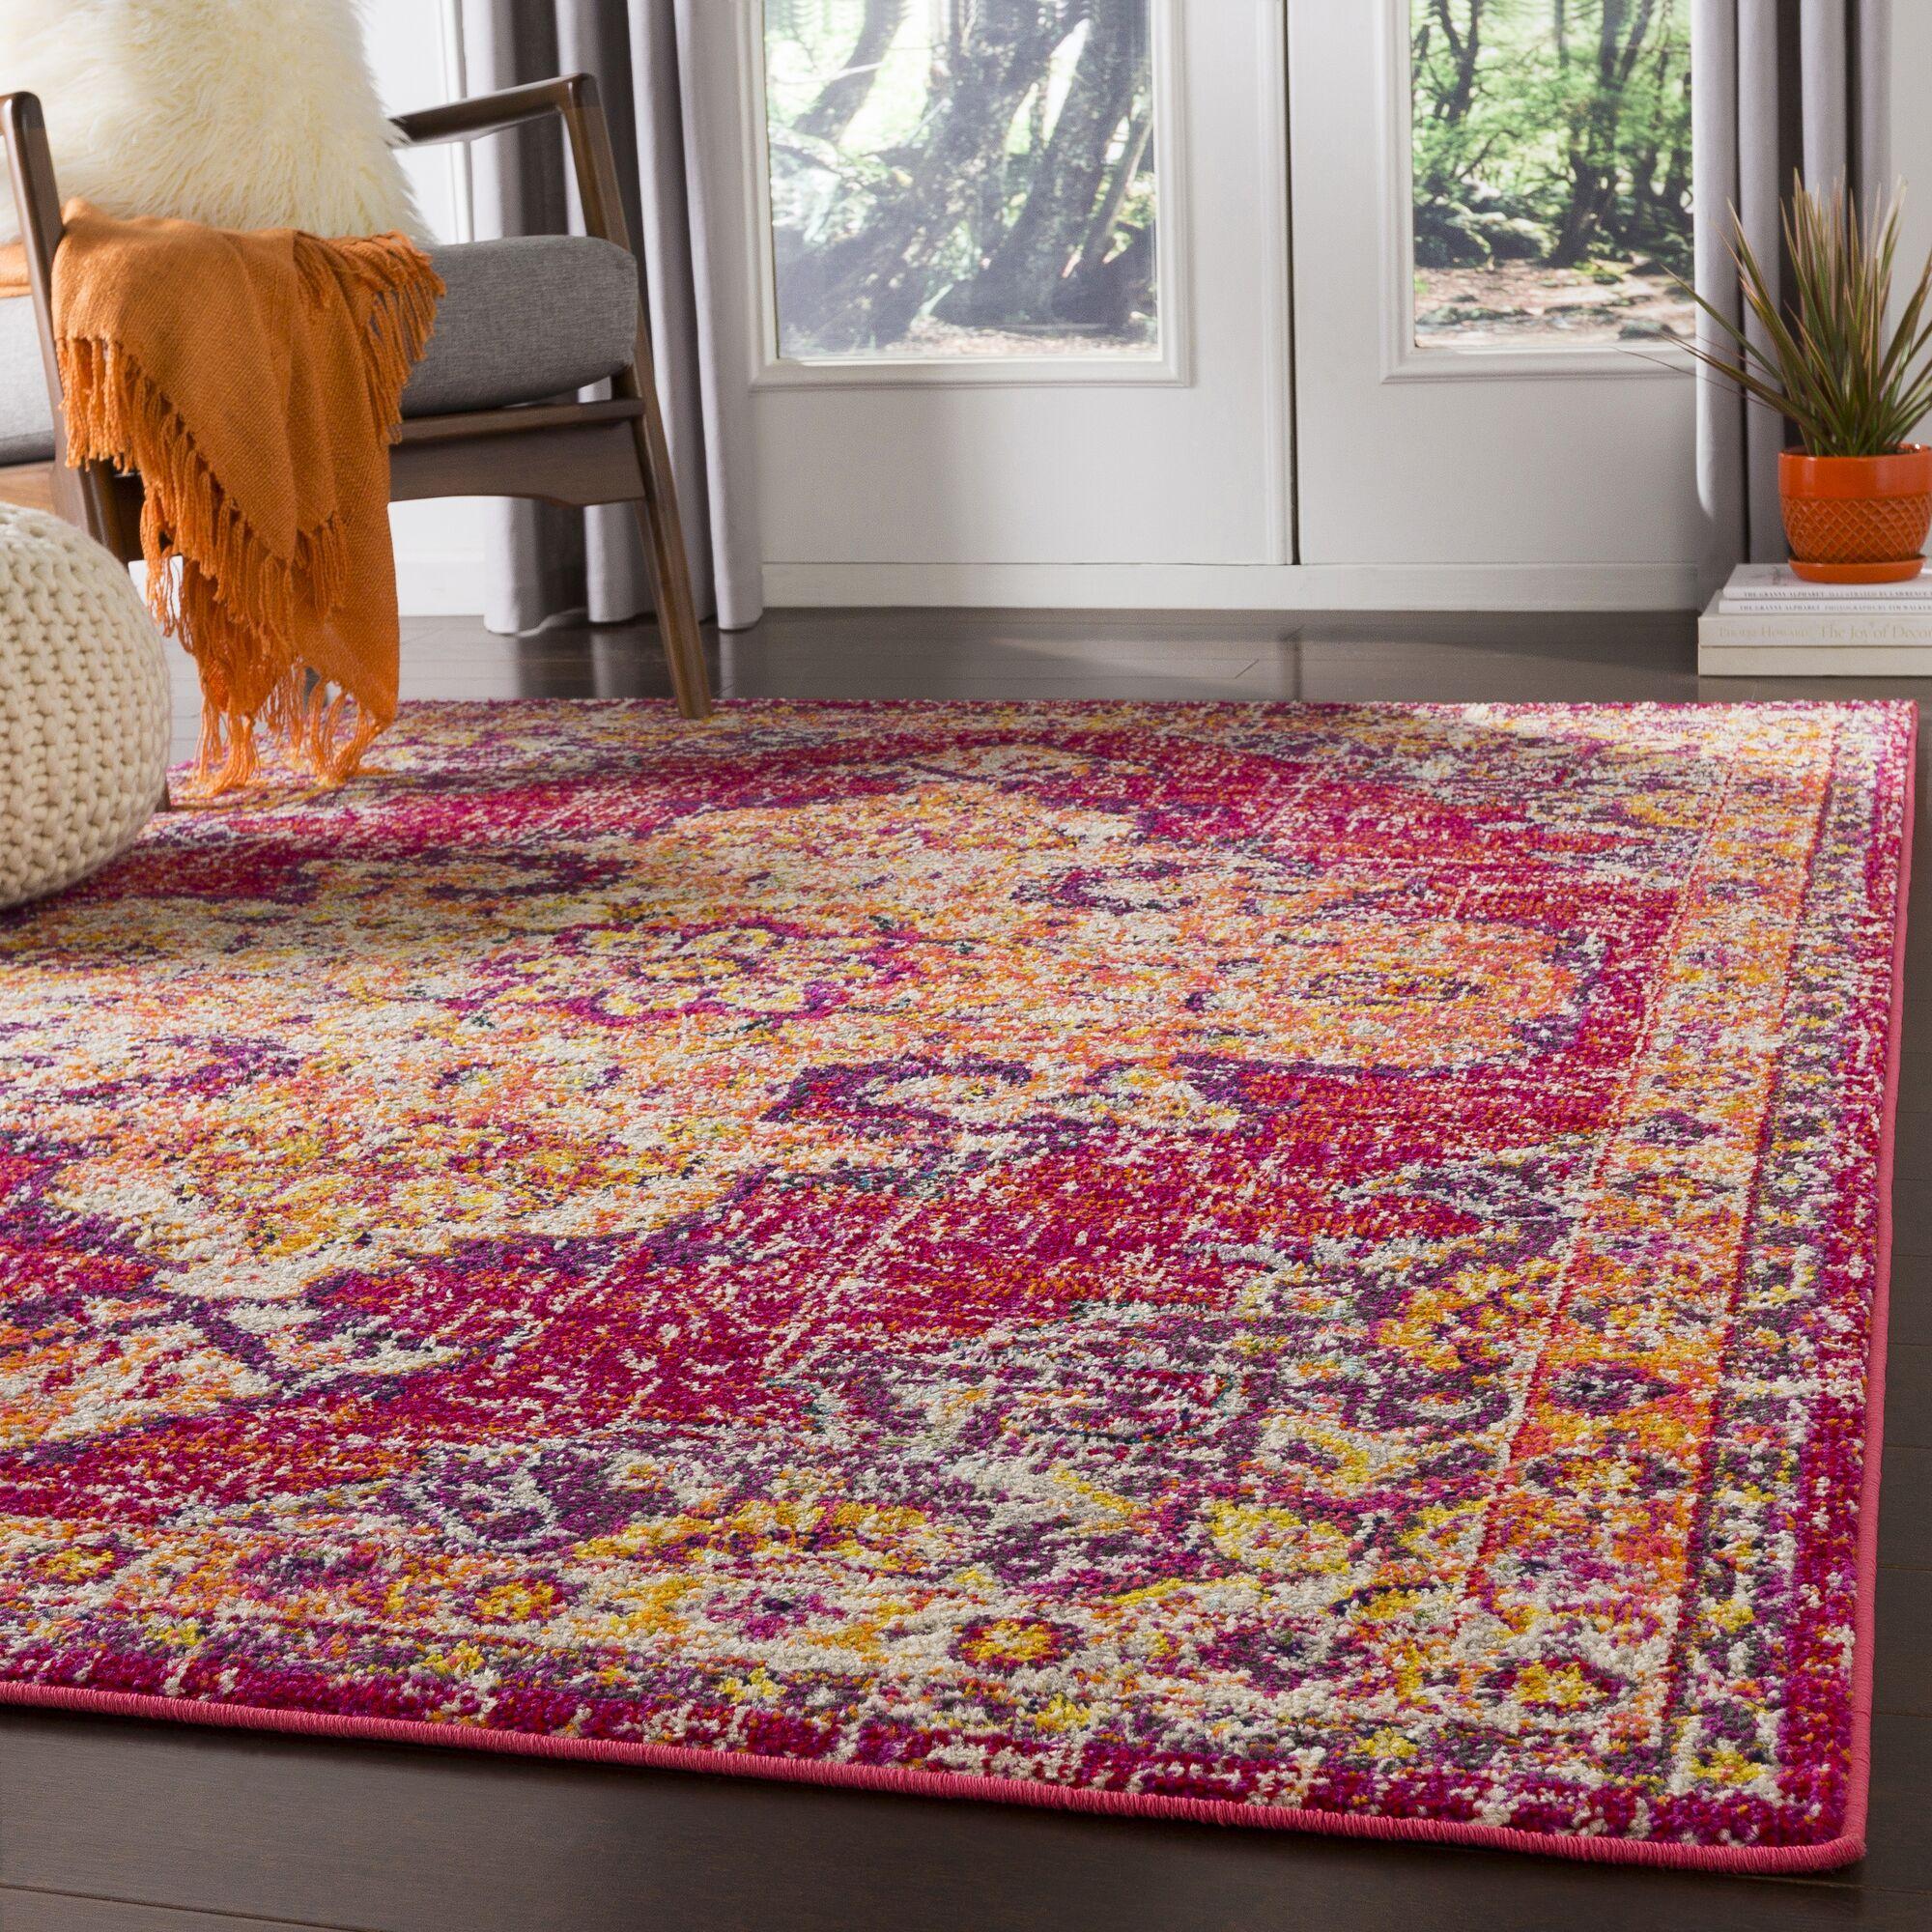 Berry Pink/Orange Area Rug Rug Size: Rectangle 7'10